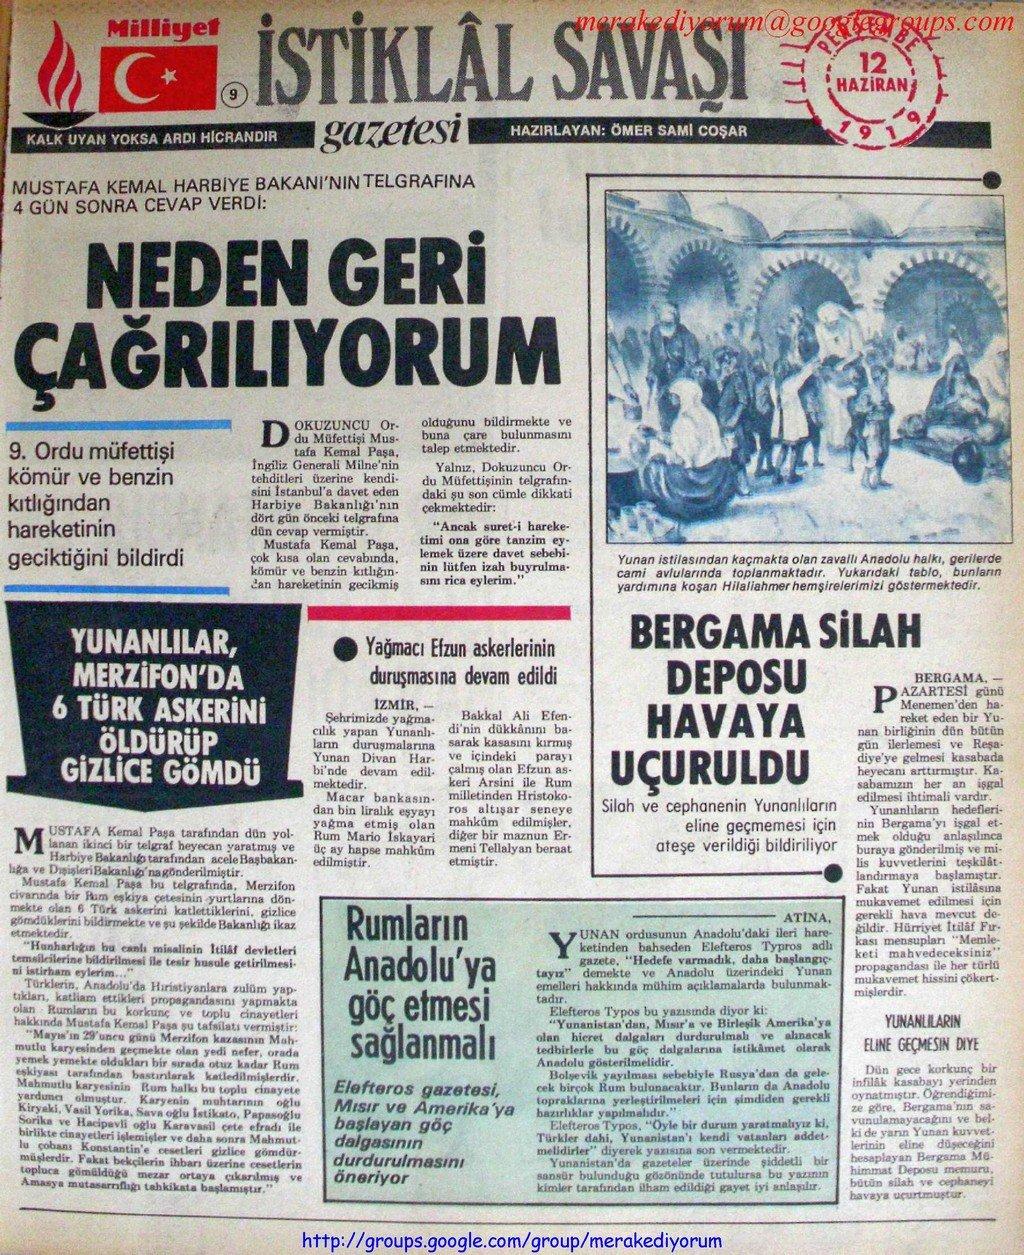 istiklal savaşı gazetesi - 12 haziran 1919